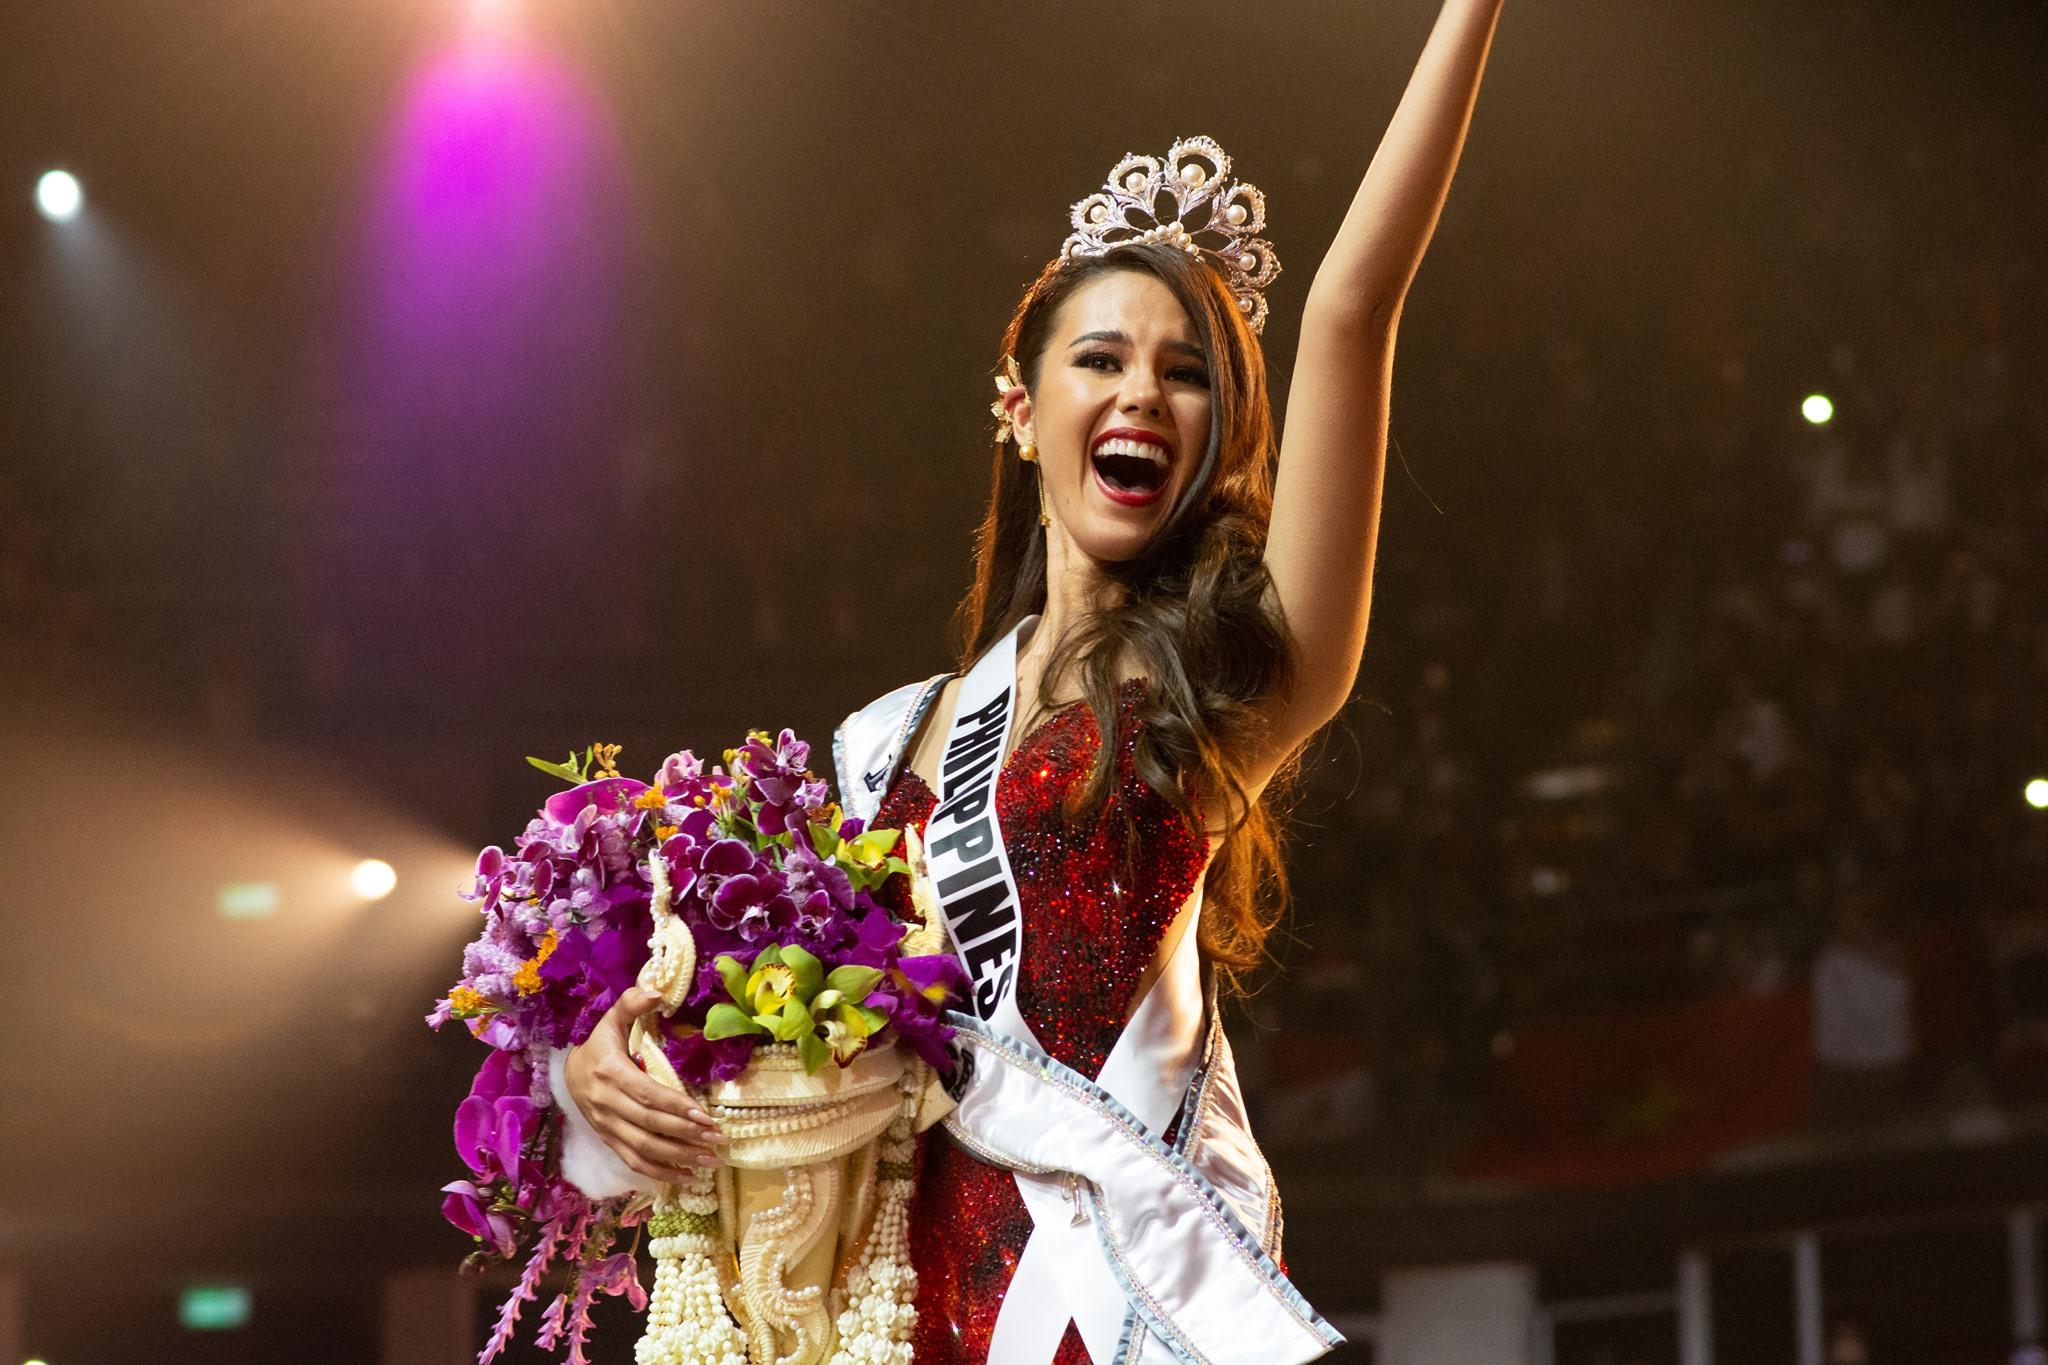 Miss Universe 2018 (2018) - IMDb